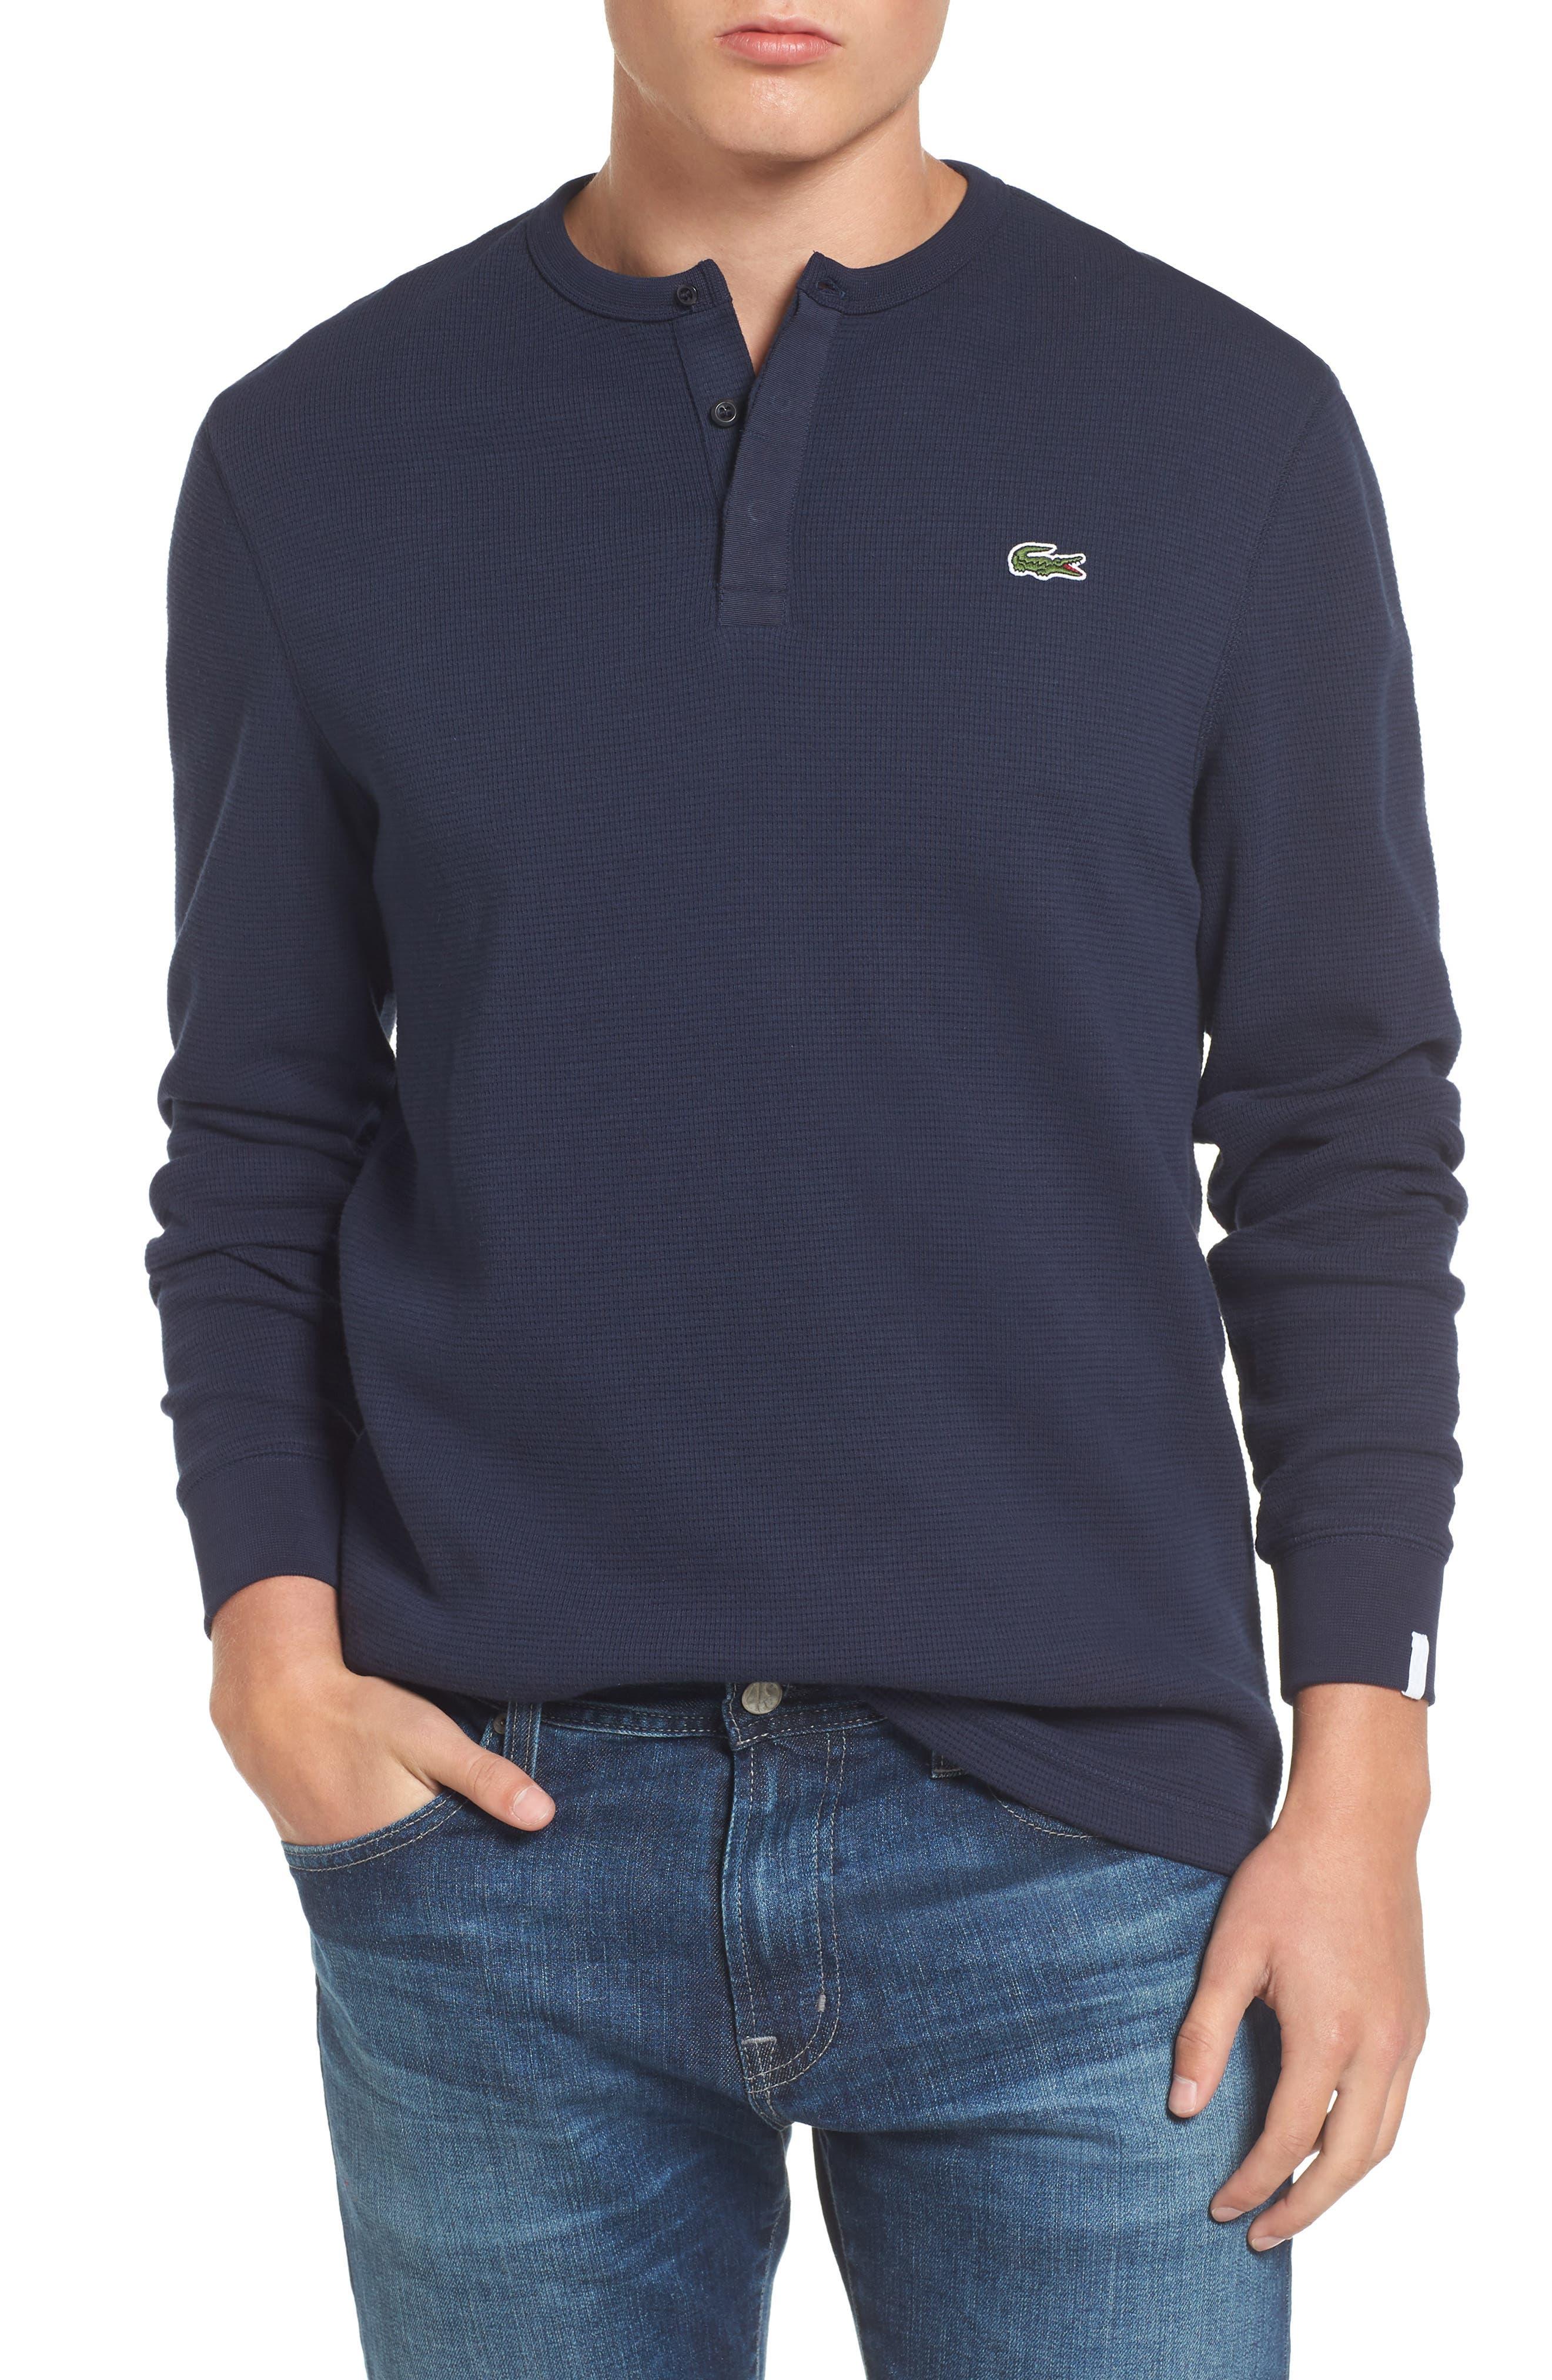 Henley T-Shirt,                         Main,                         color, 423 Navy Blue/ Navy Blue